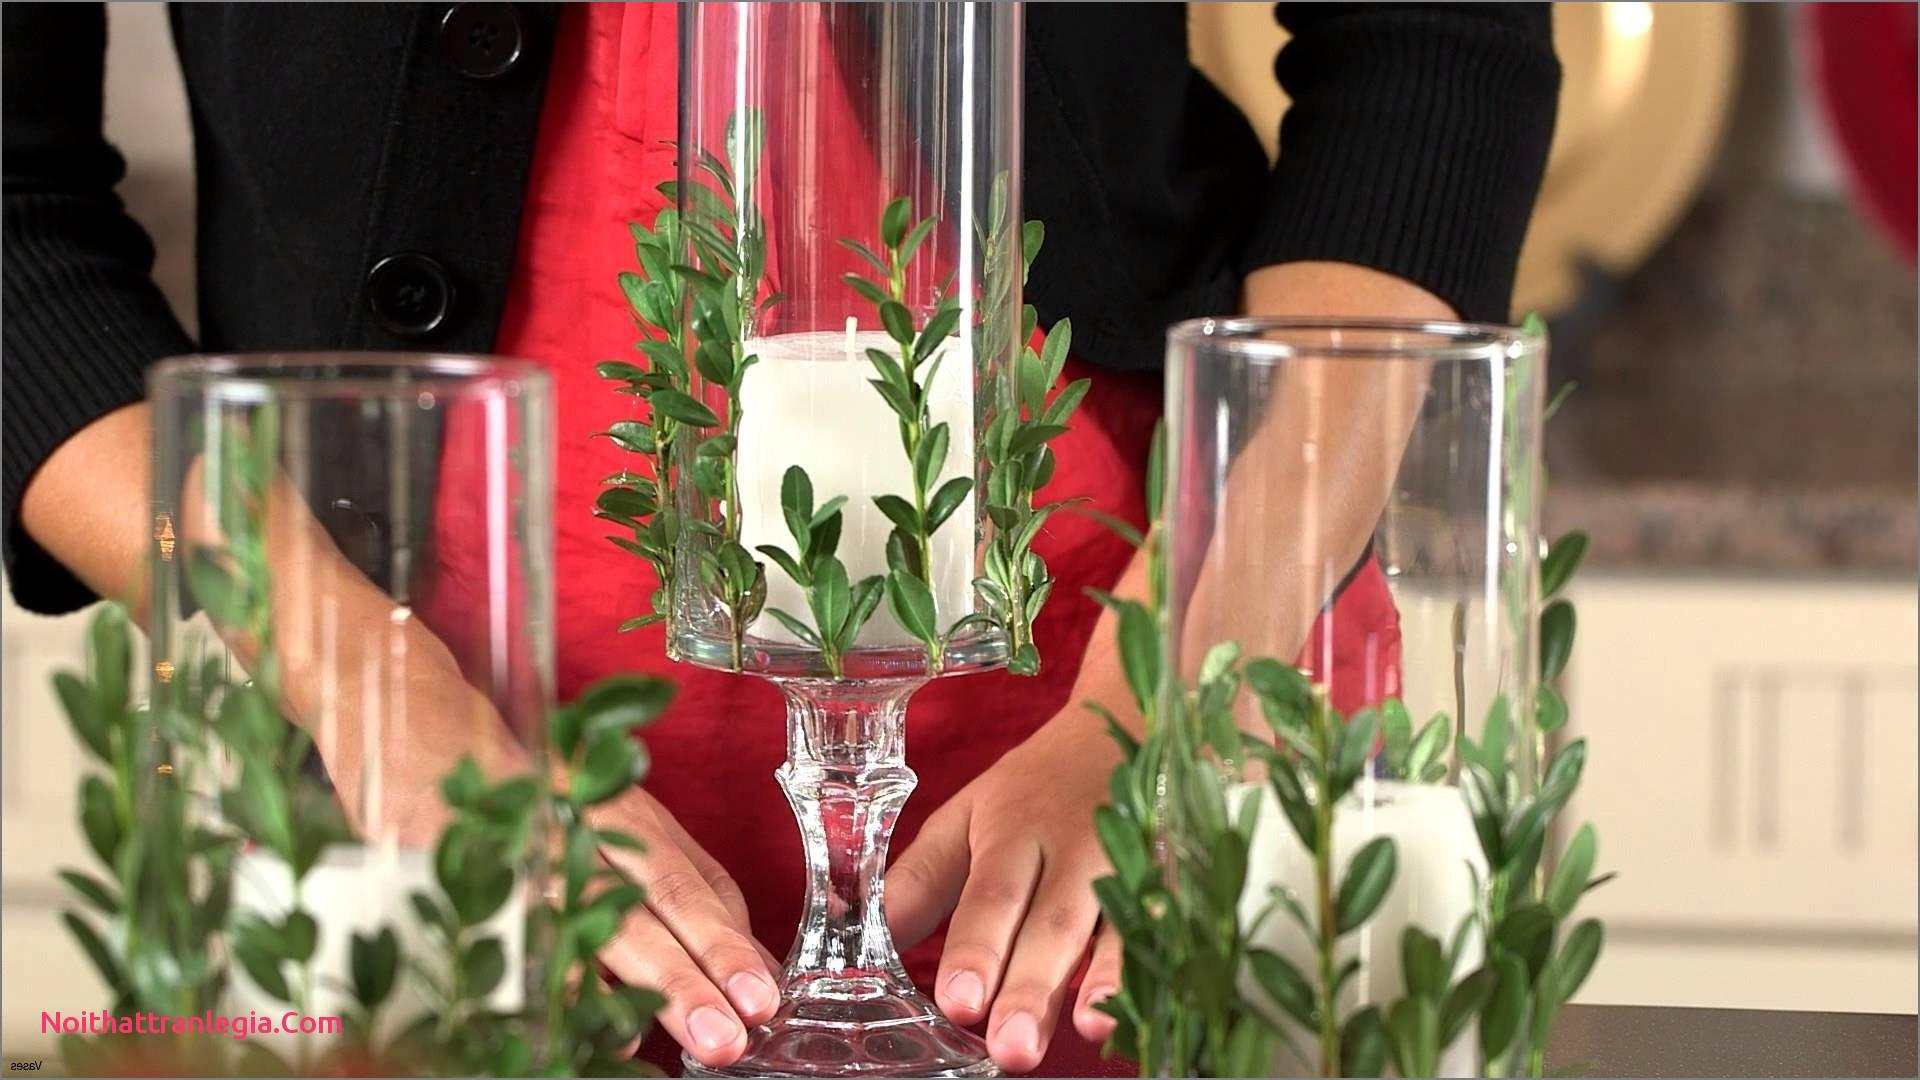 small glass bud vases of 20 wedding vases noithattranlegia vases design with wedding centerpiece decoration ideas unique dollar tree wedding decorations awesome h vases dollar vase i 0d